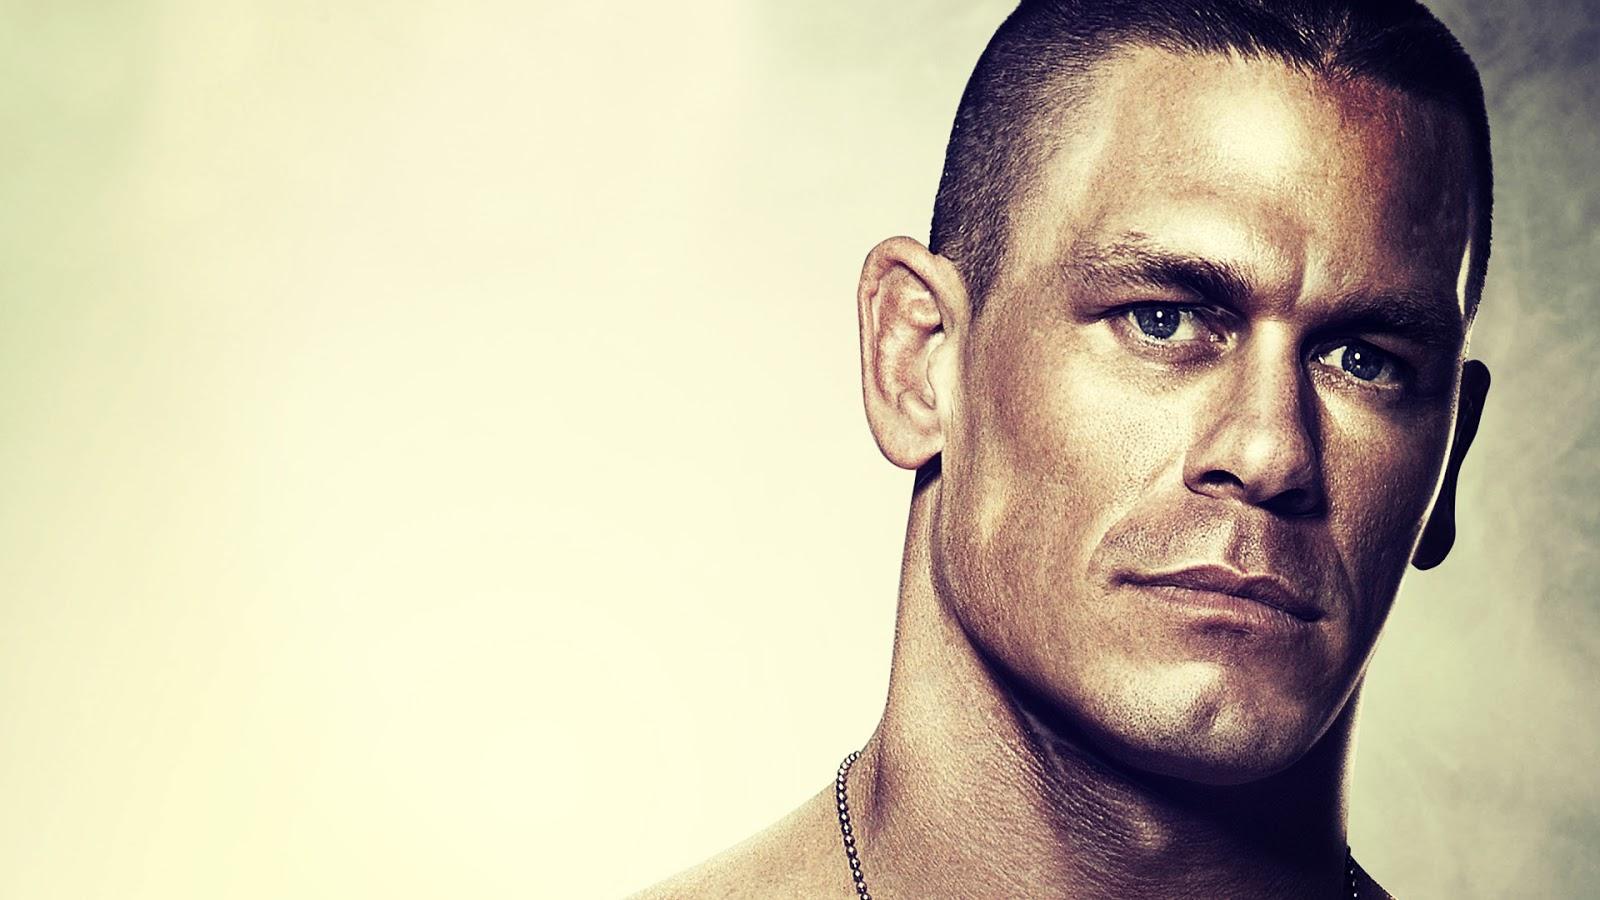 John Cena WWE Wallpaper HD 1080p